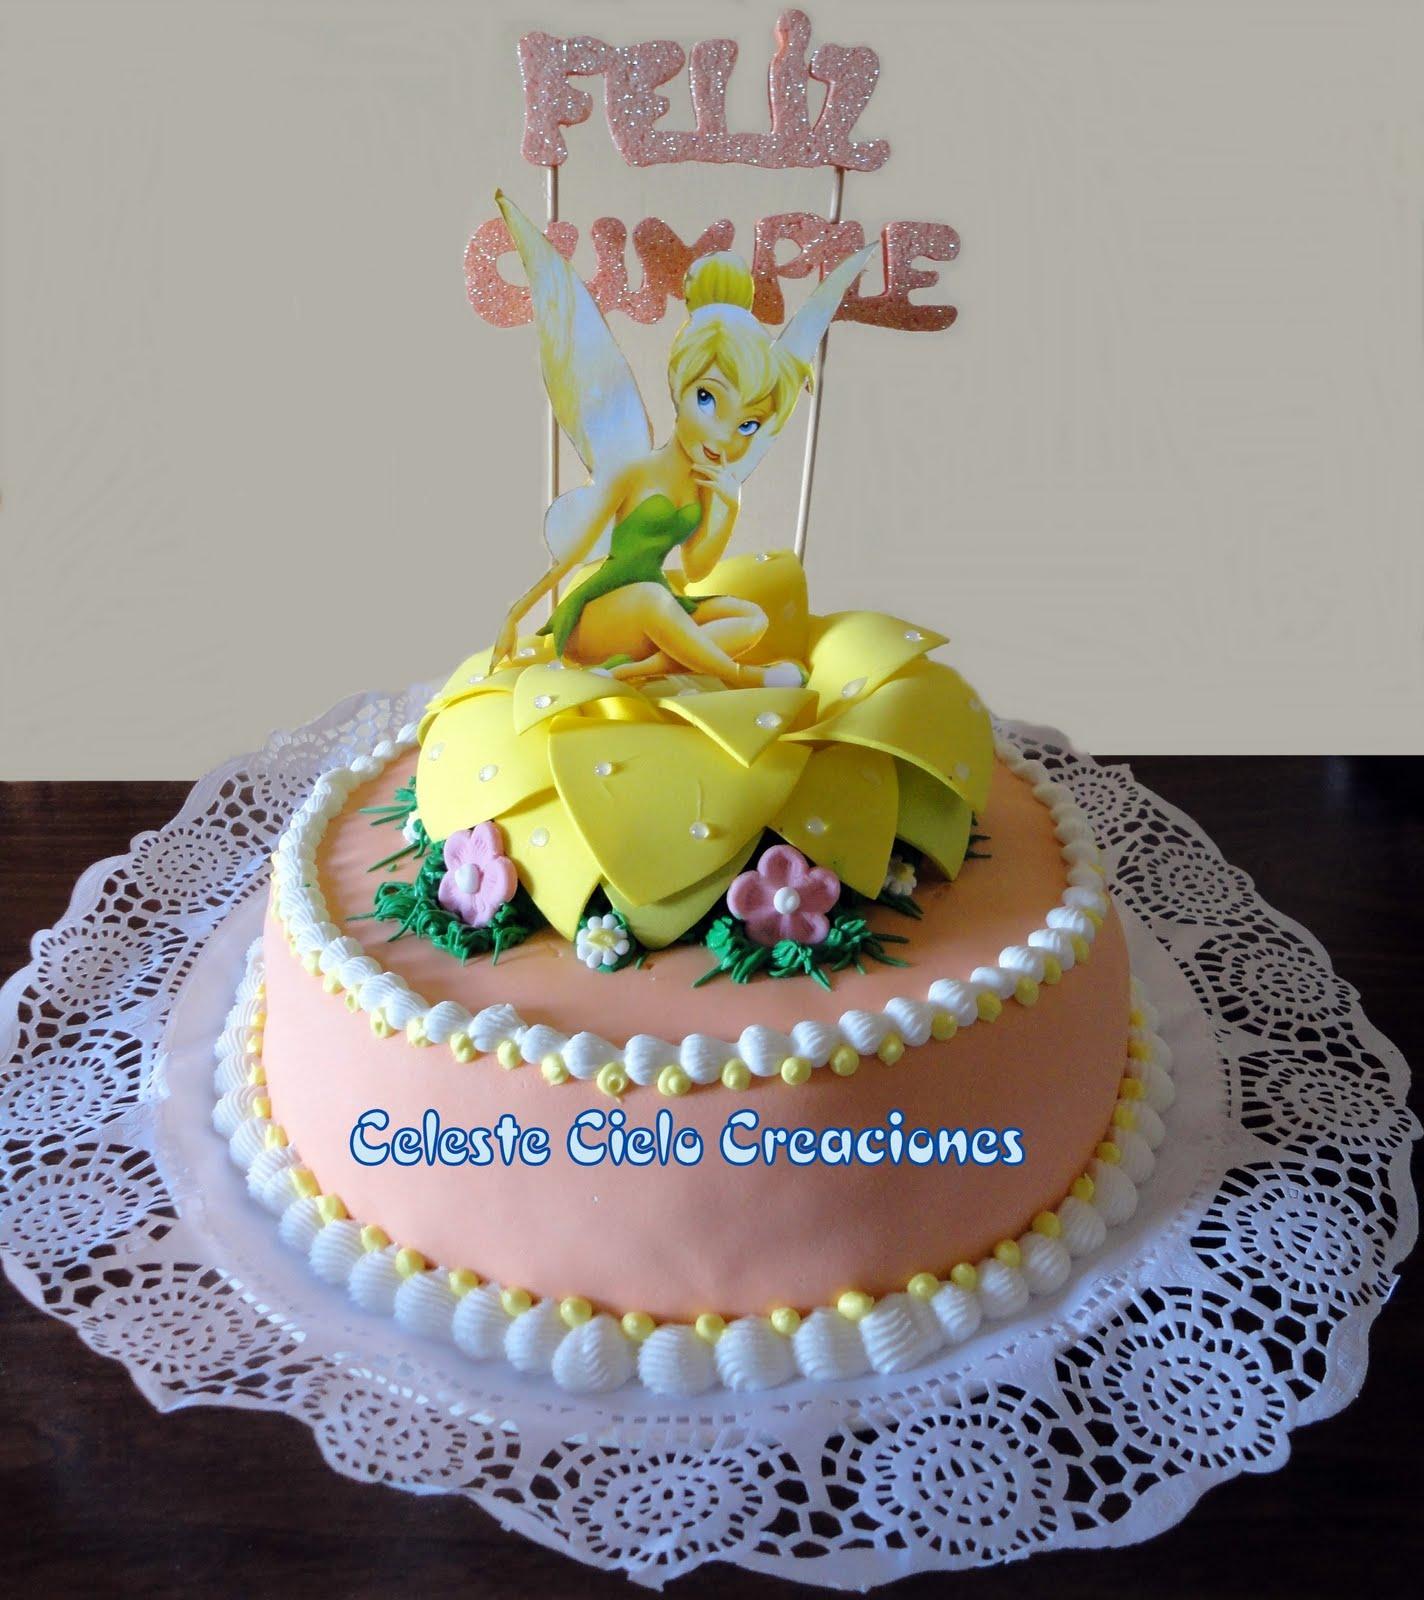 Celeste Cielo Creaciones: Tortas decoradas: Campanita / Tinkerbell